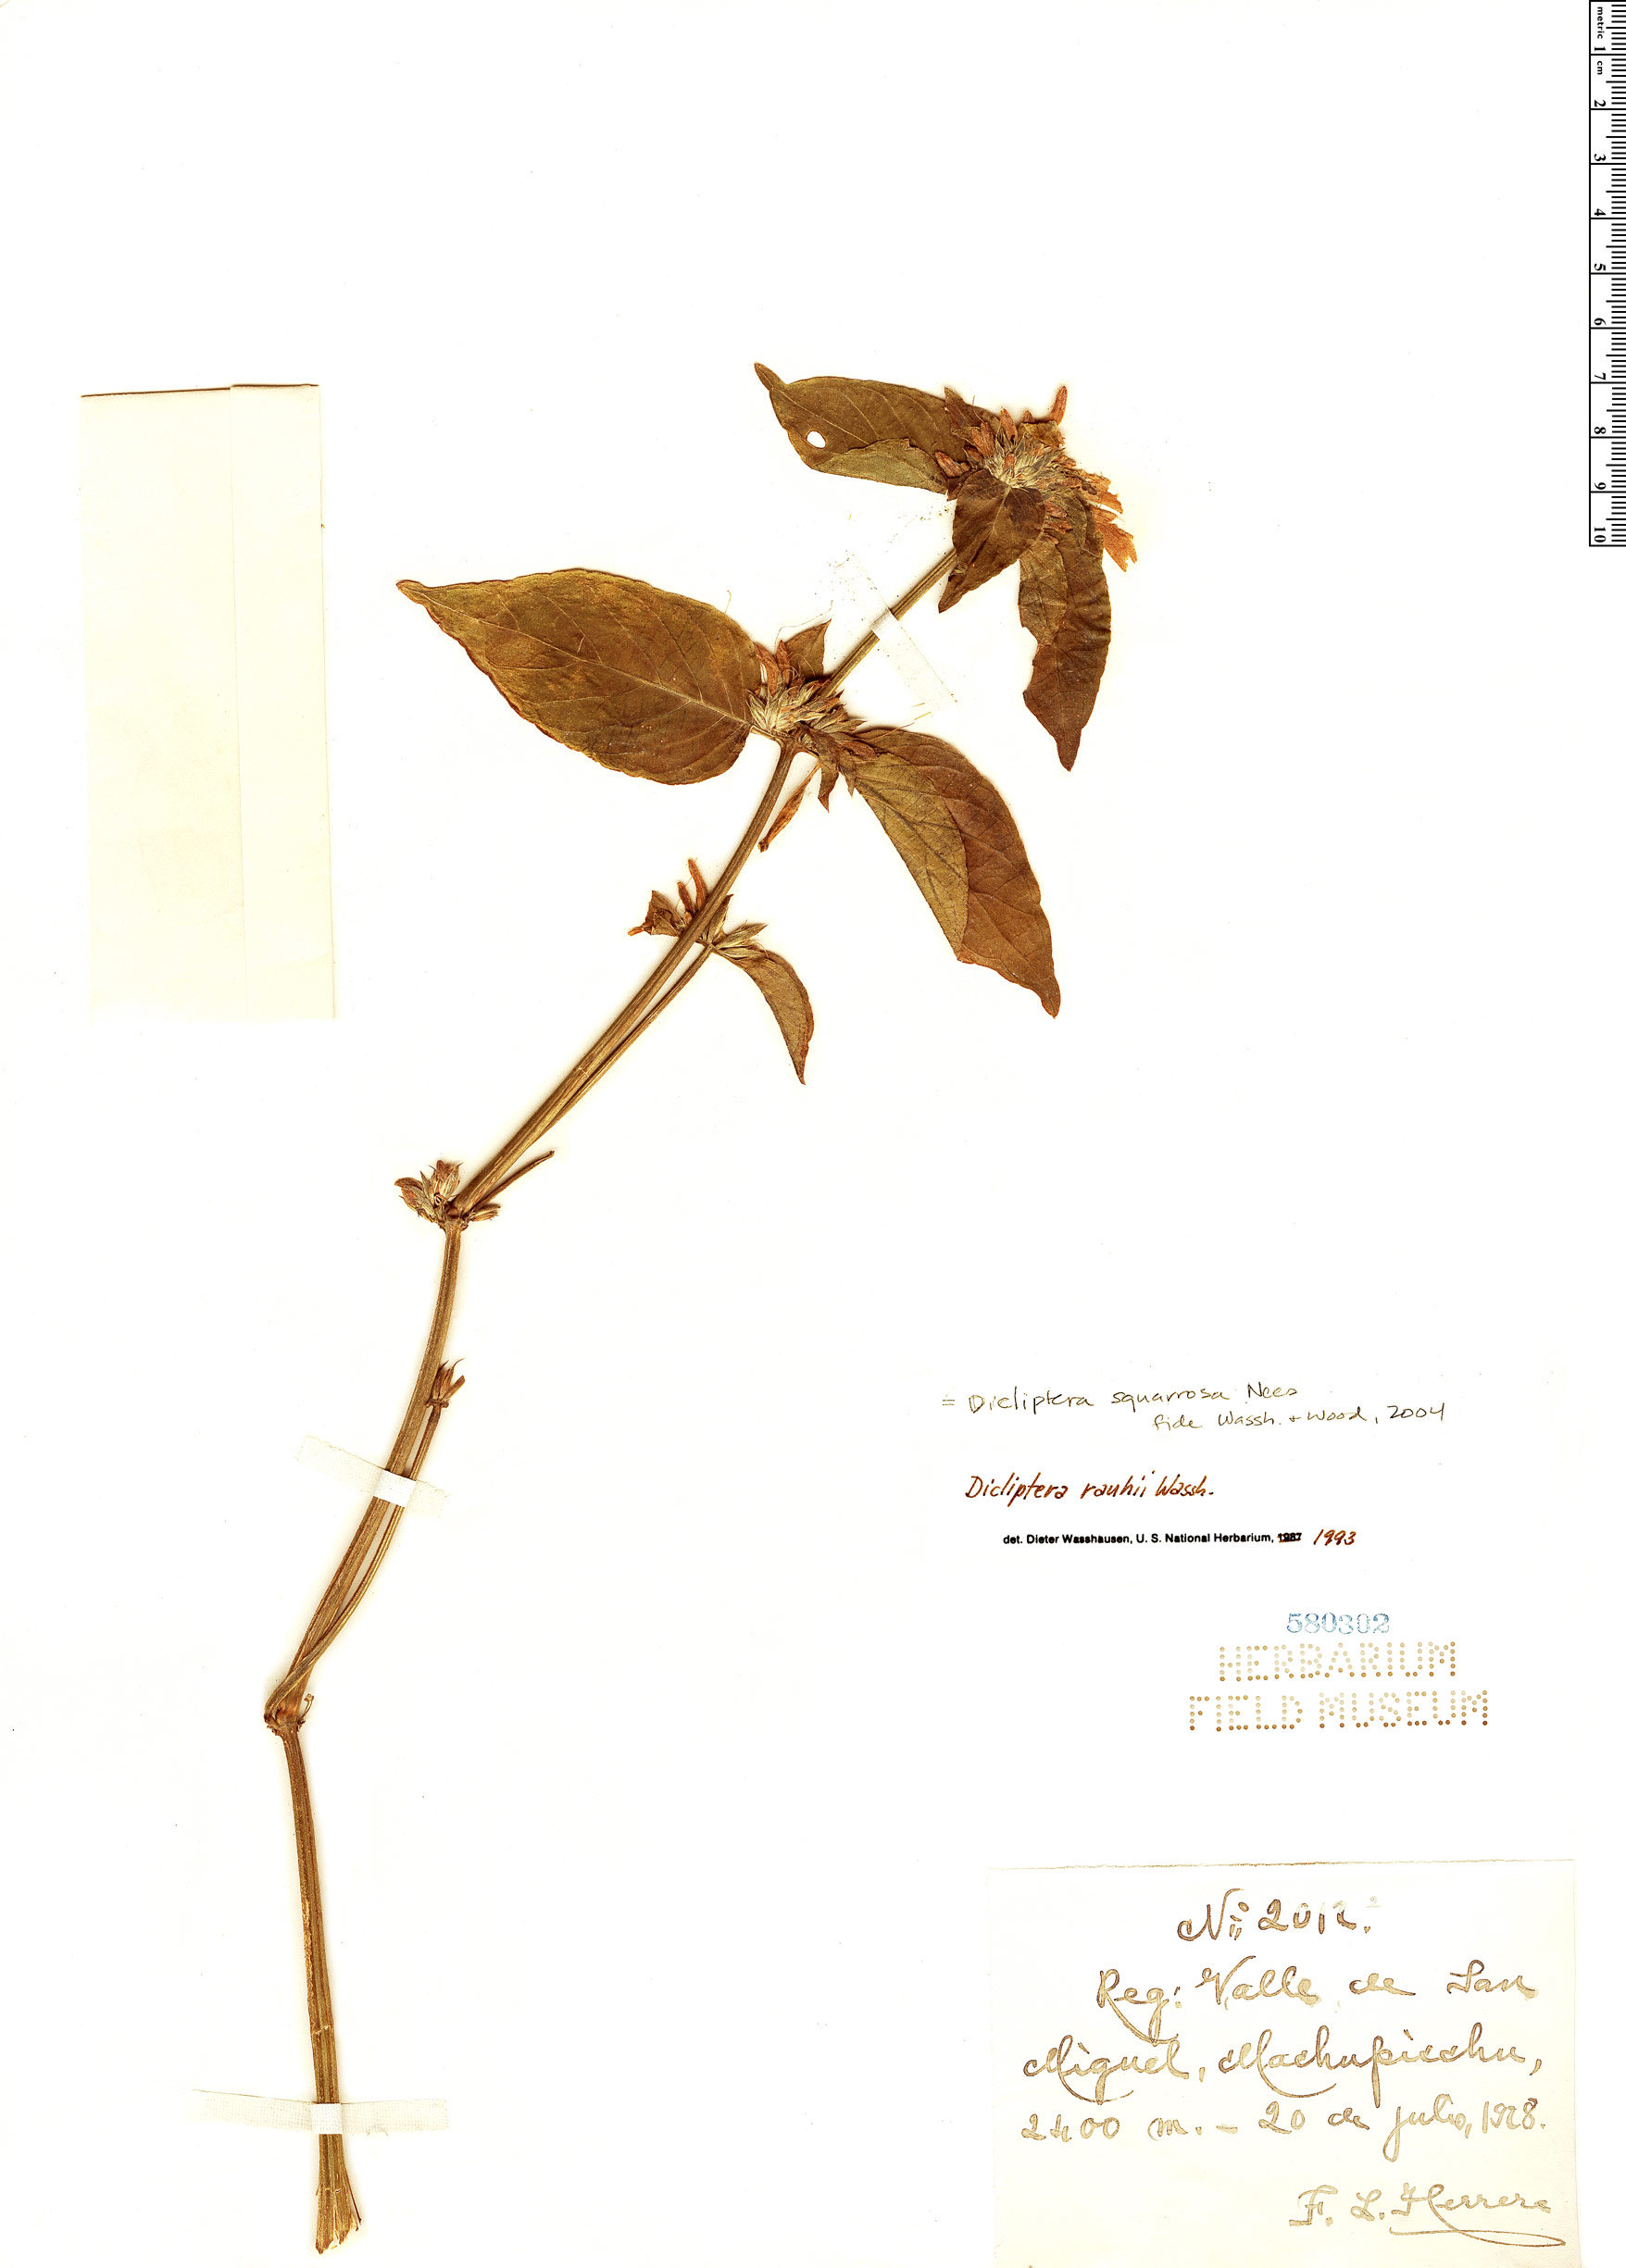 Espécime: Dicliptera squarrosa